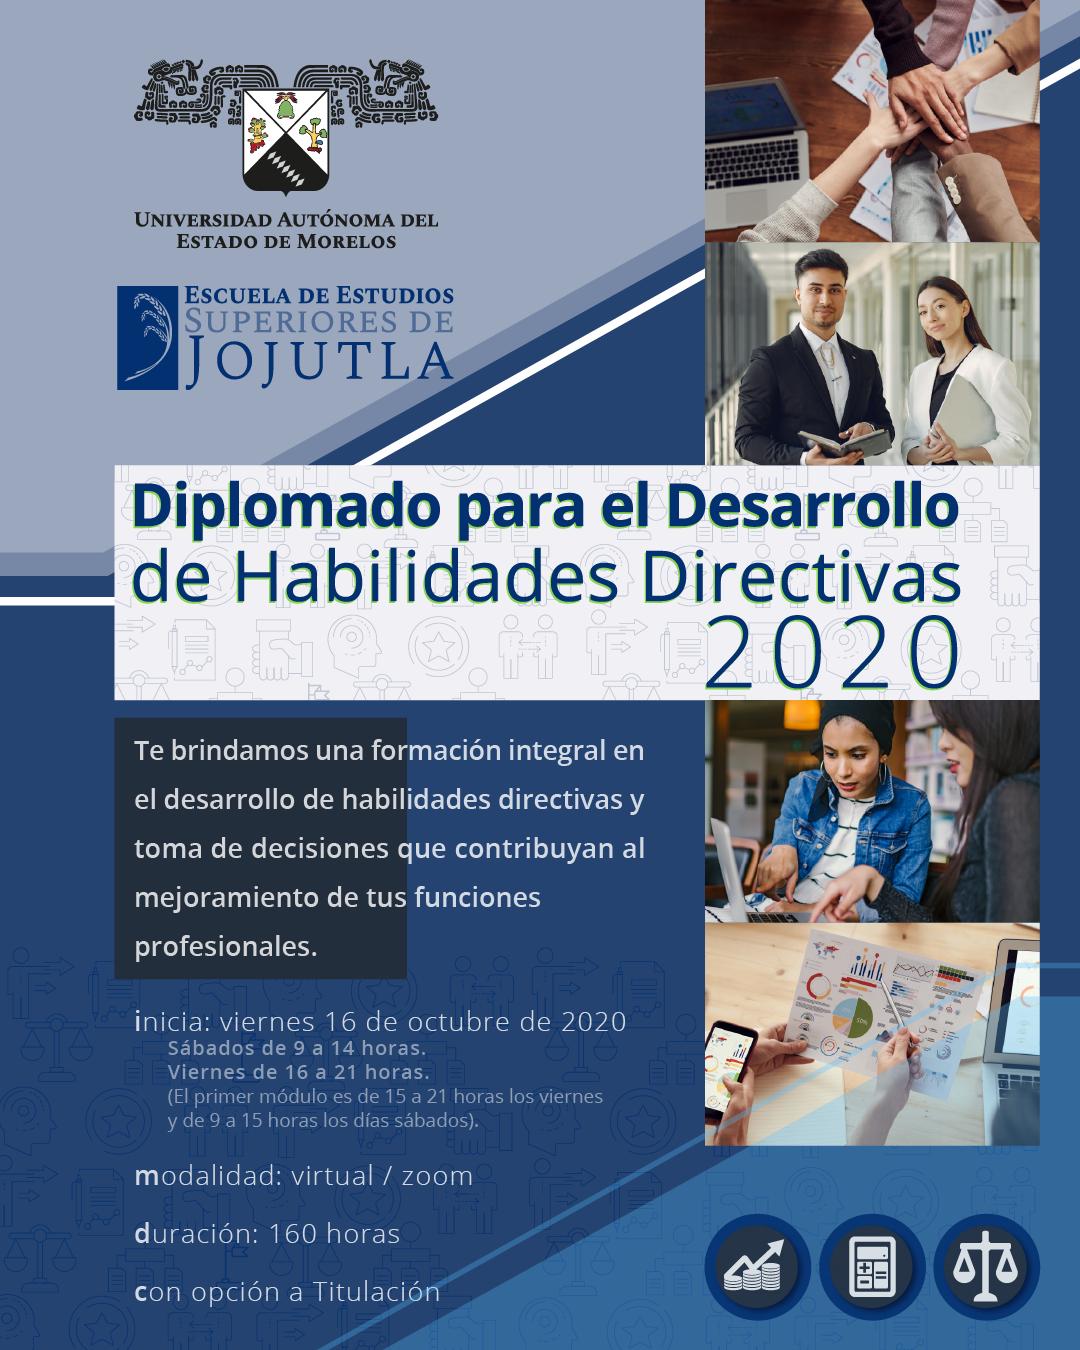 Diplomado_2020_EESJojutla_1_2